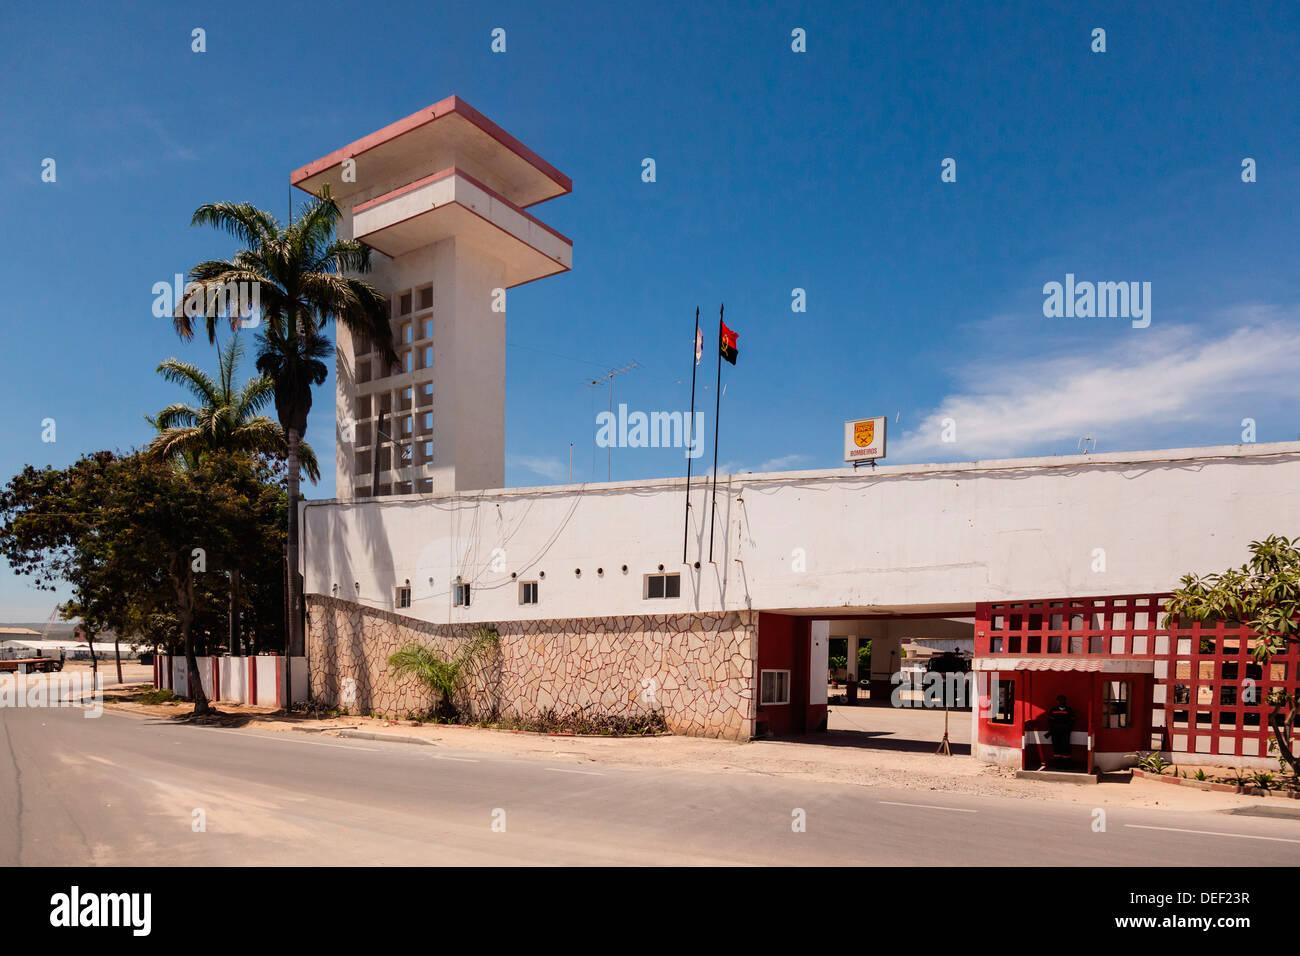 Africa, Angola, Lobito. Roadside shot of fire station. - Stock Image